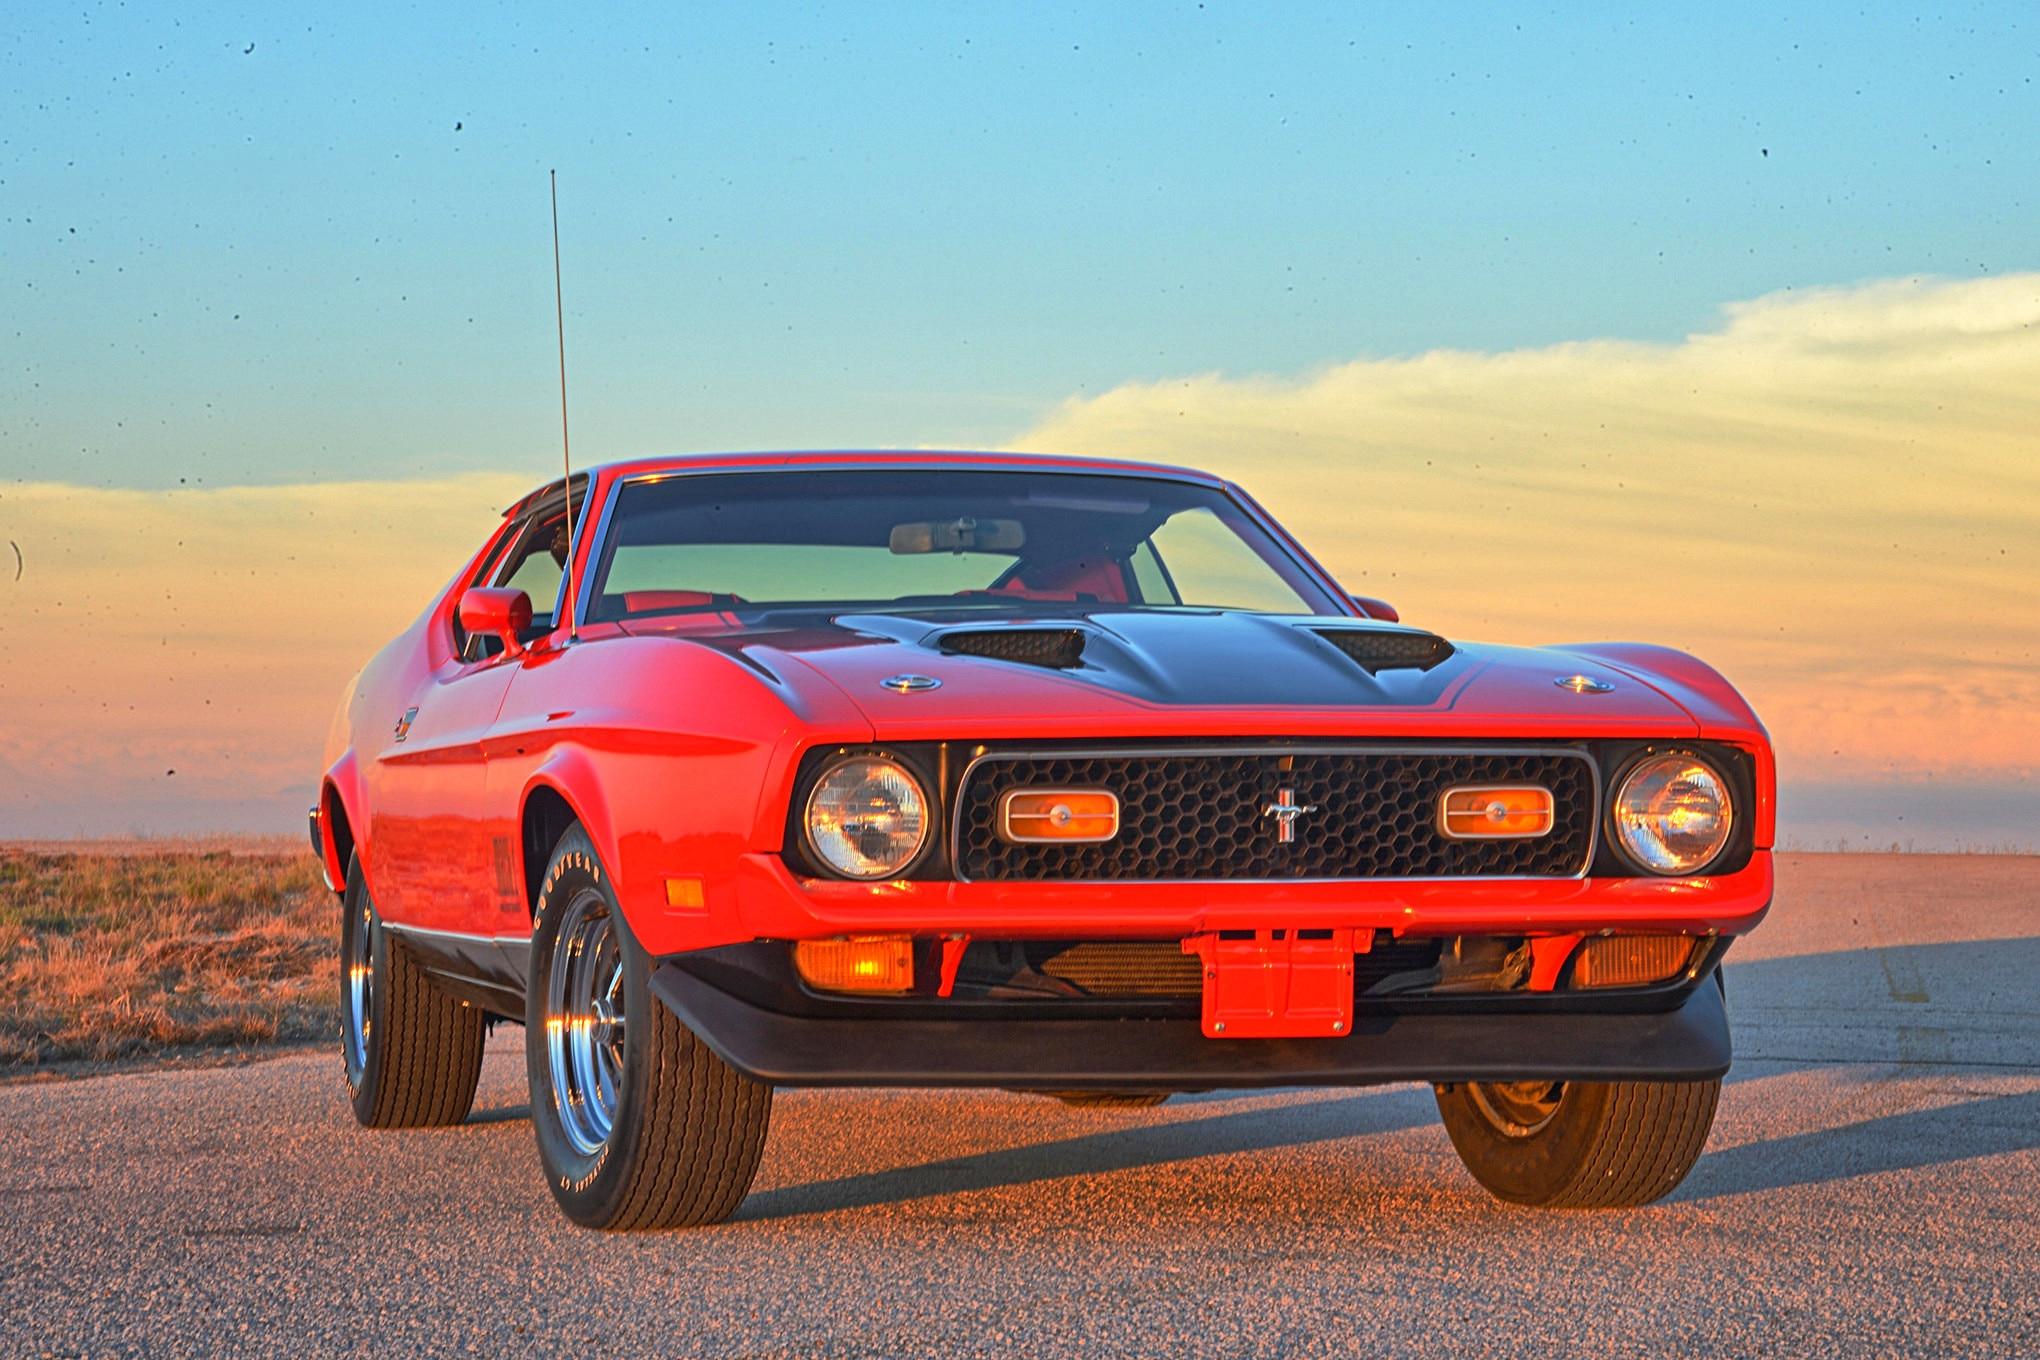 005 1971 73 Mustang SpottersGuide Heasley